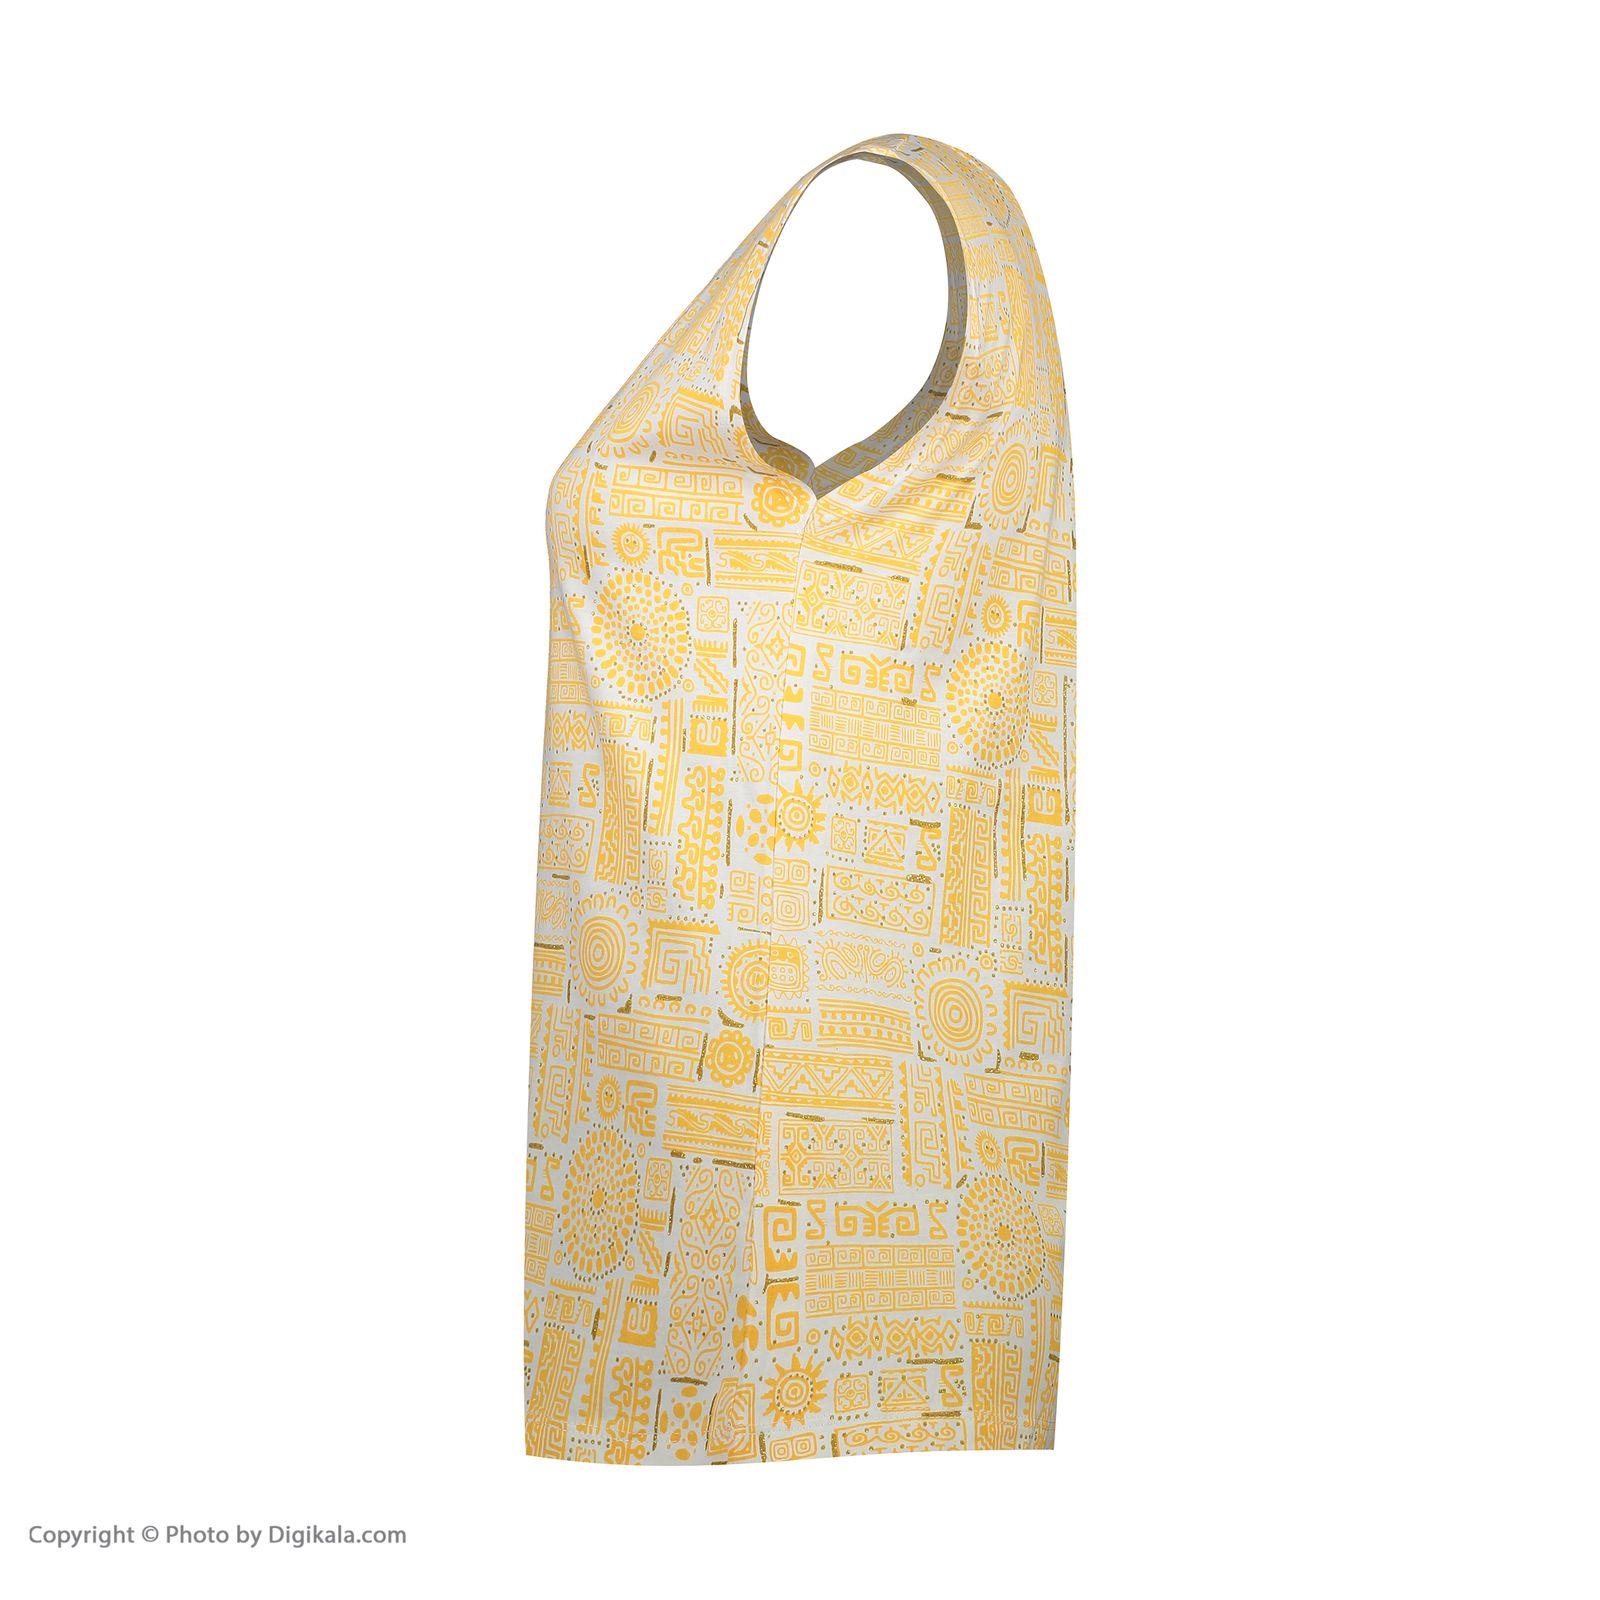 ست تاپ و شلوارک زنانه کد 0217 رنگ زرد -  - 8